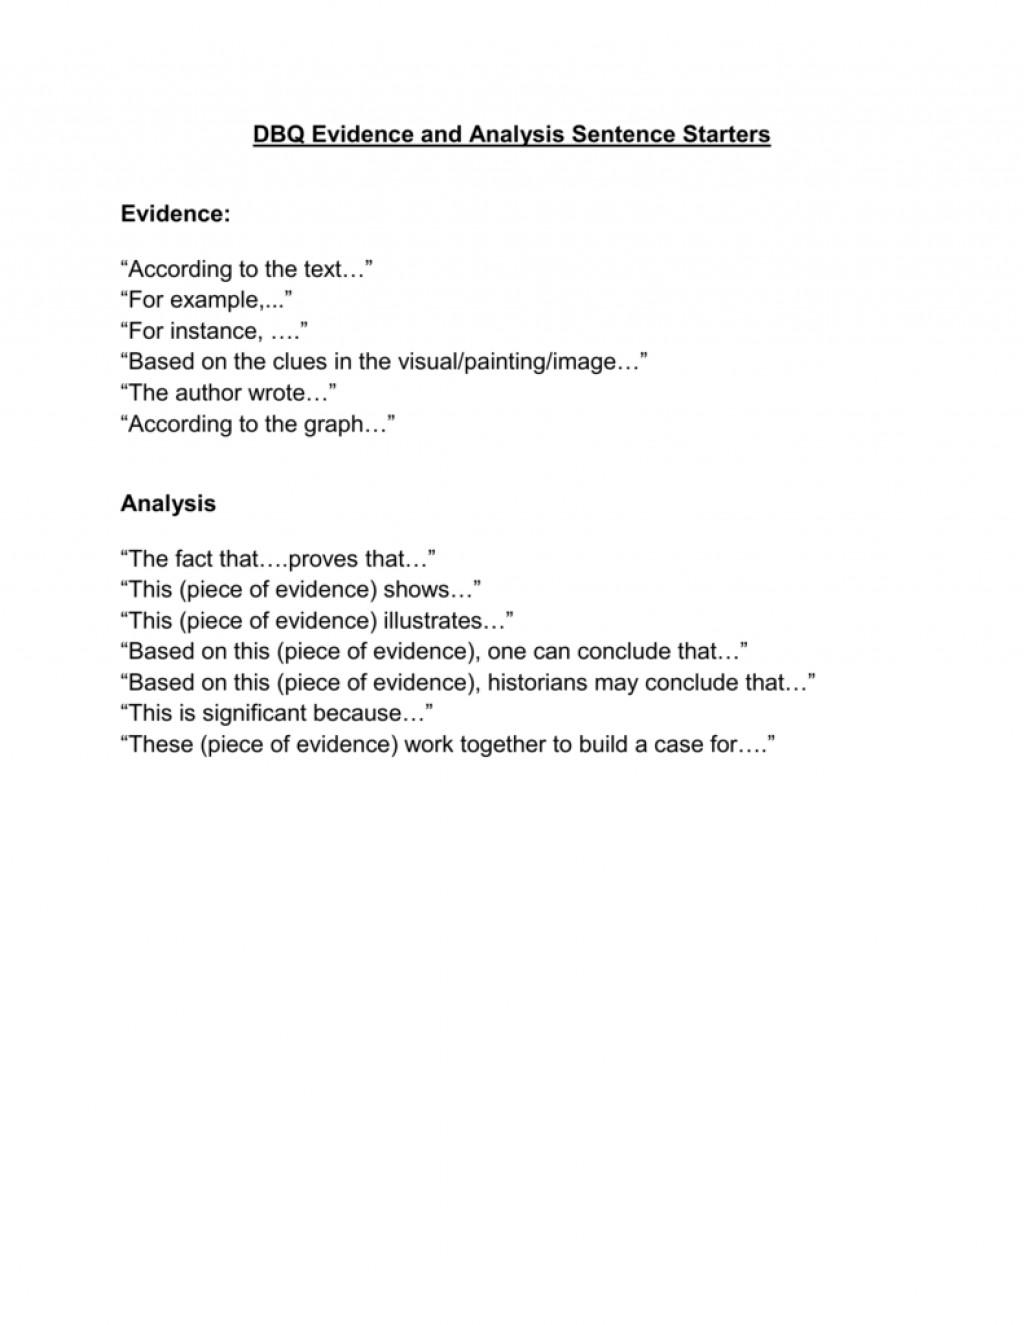 005 Essay Example 006841680 1 Paragraph Excellent Starters Sentence Spanish Gcse Large